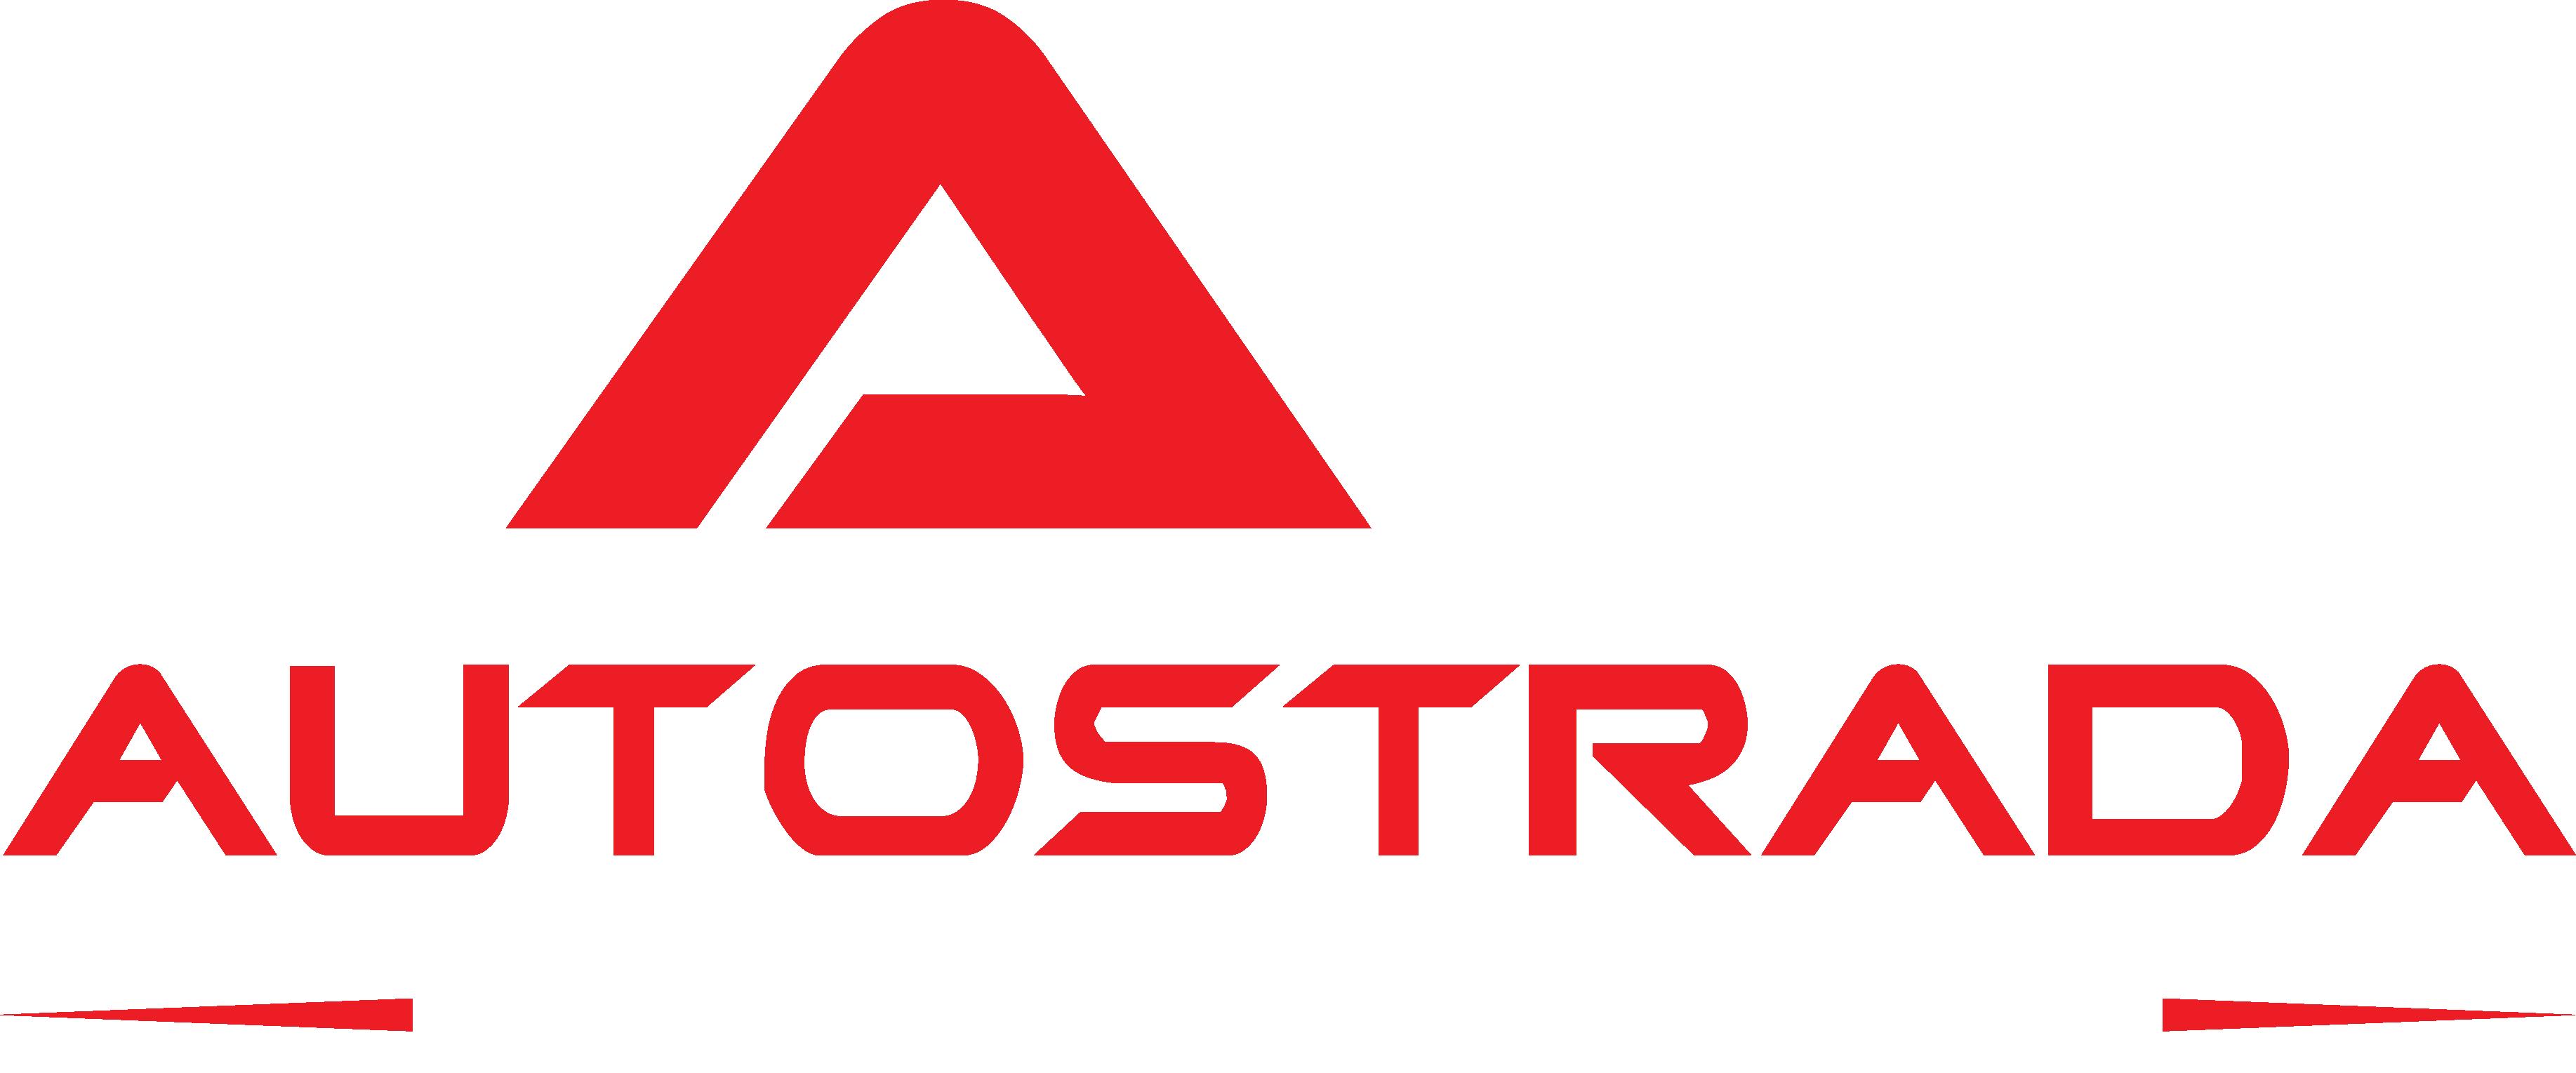 Autostradamotorsport.nl